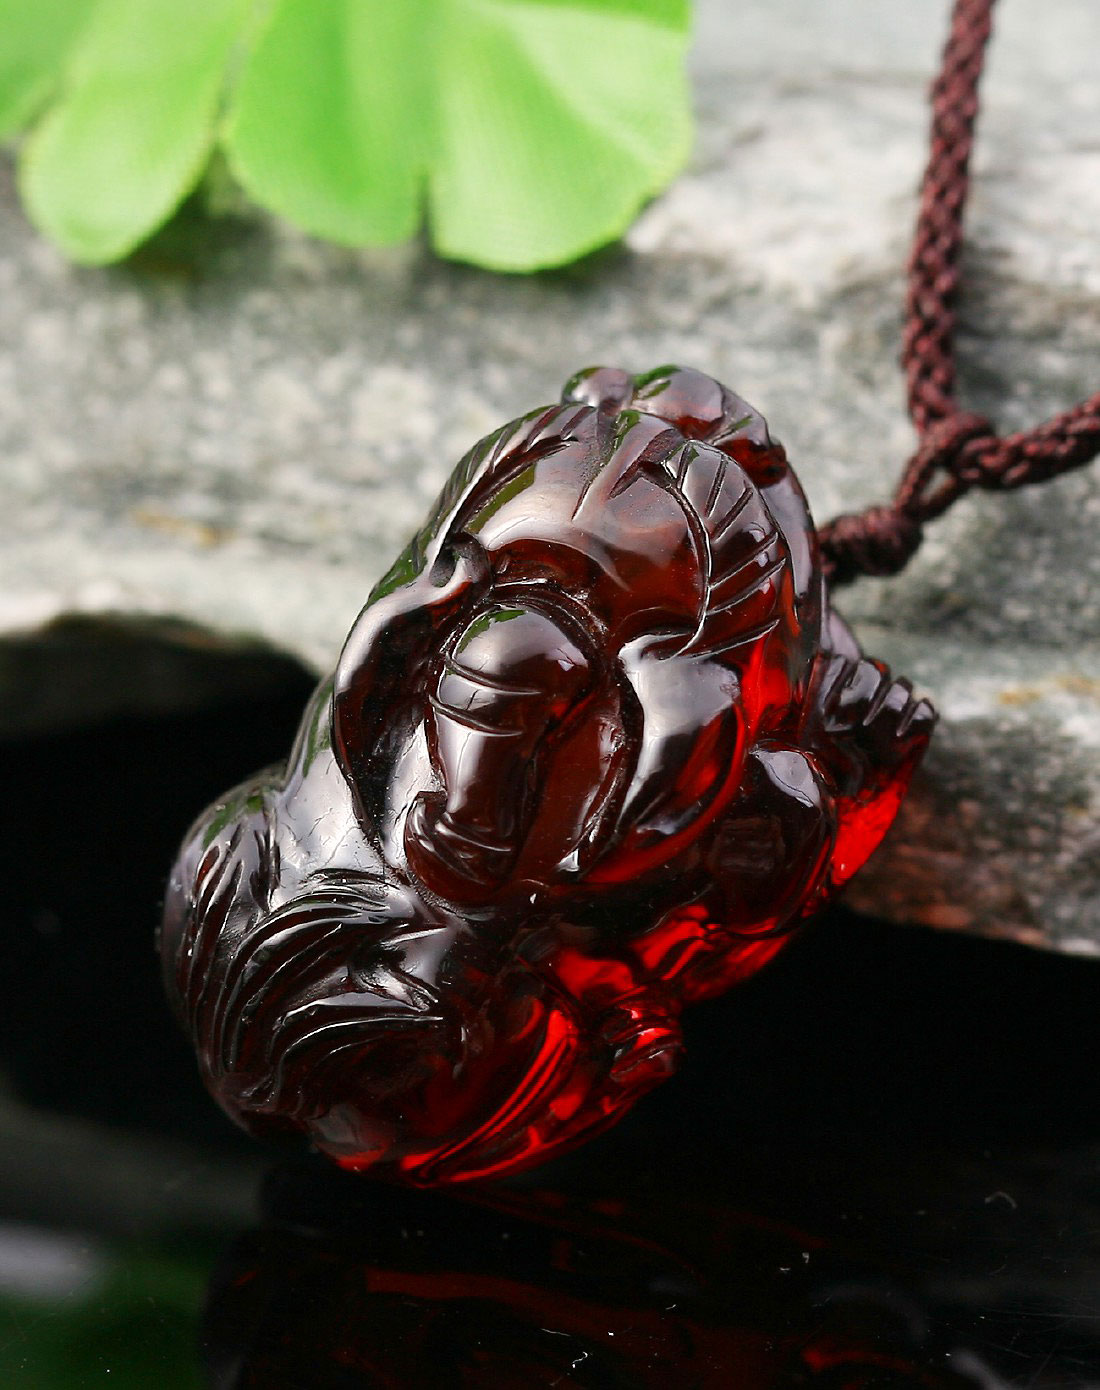 love招财貔貅血珀项链ts1209a0099